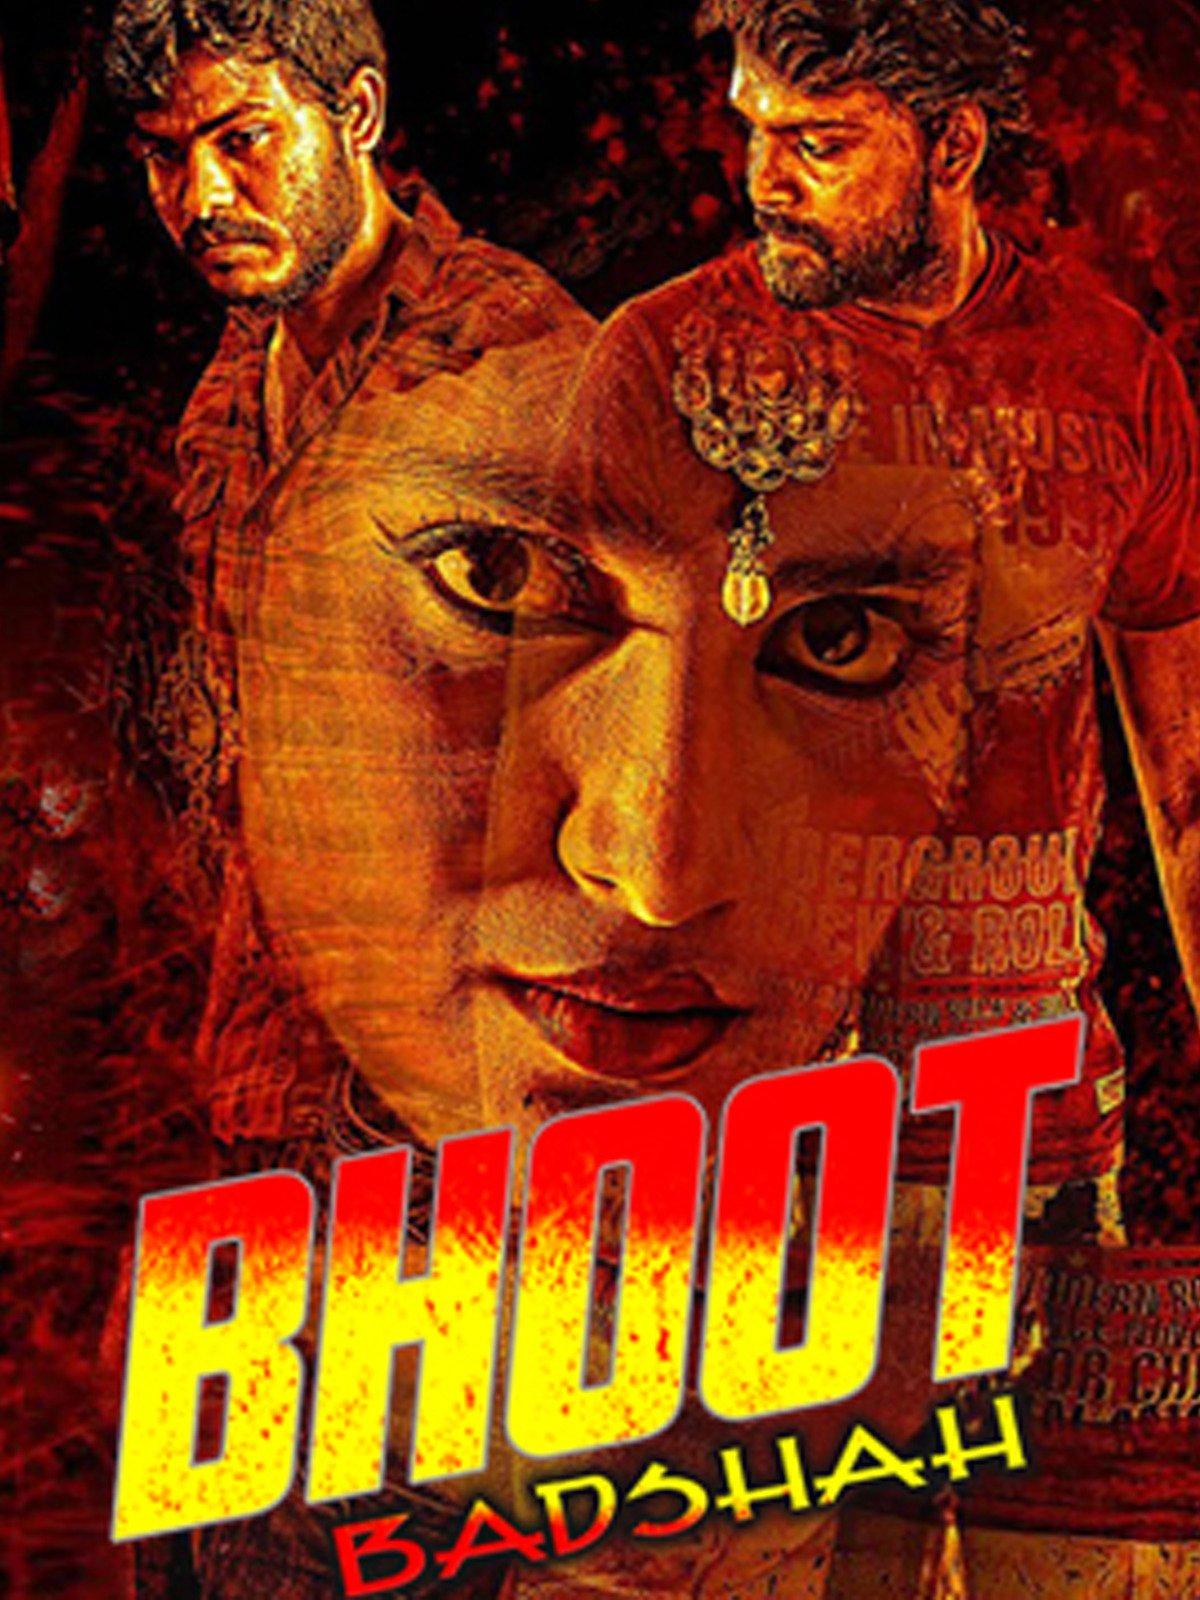 Bhoot Badshah